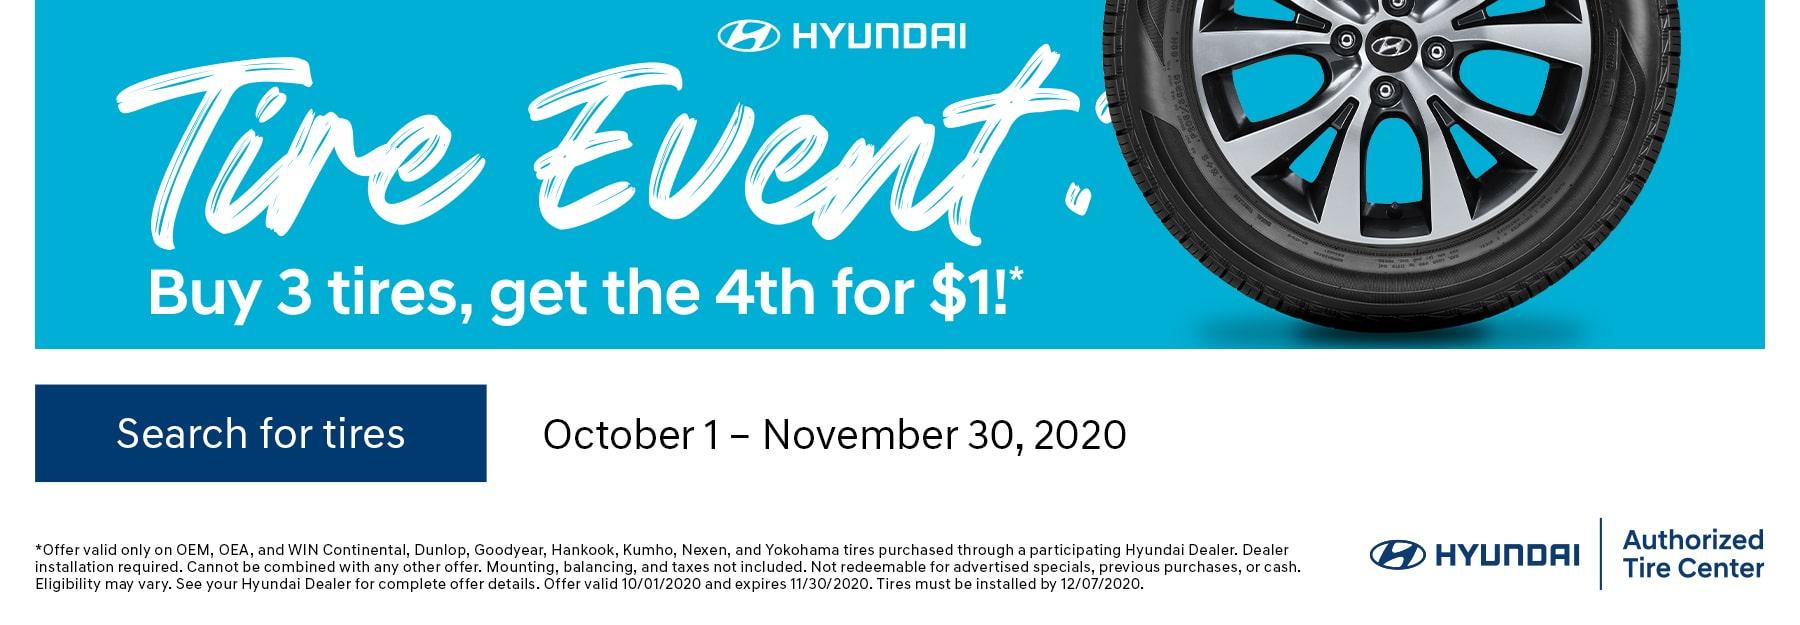 Hyundai Tire Event October 2020